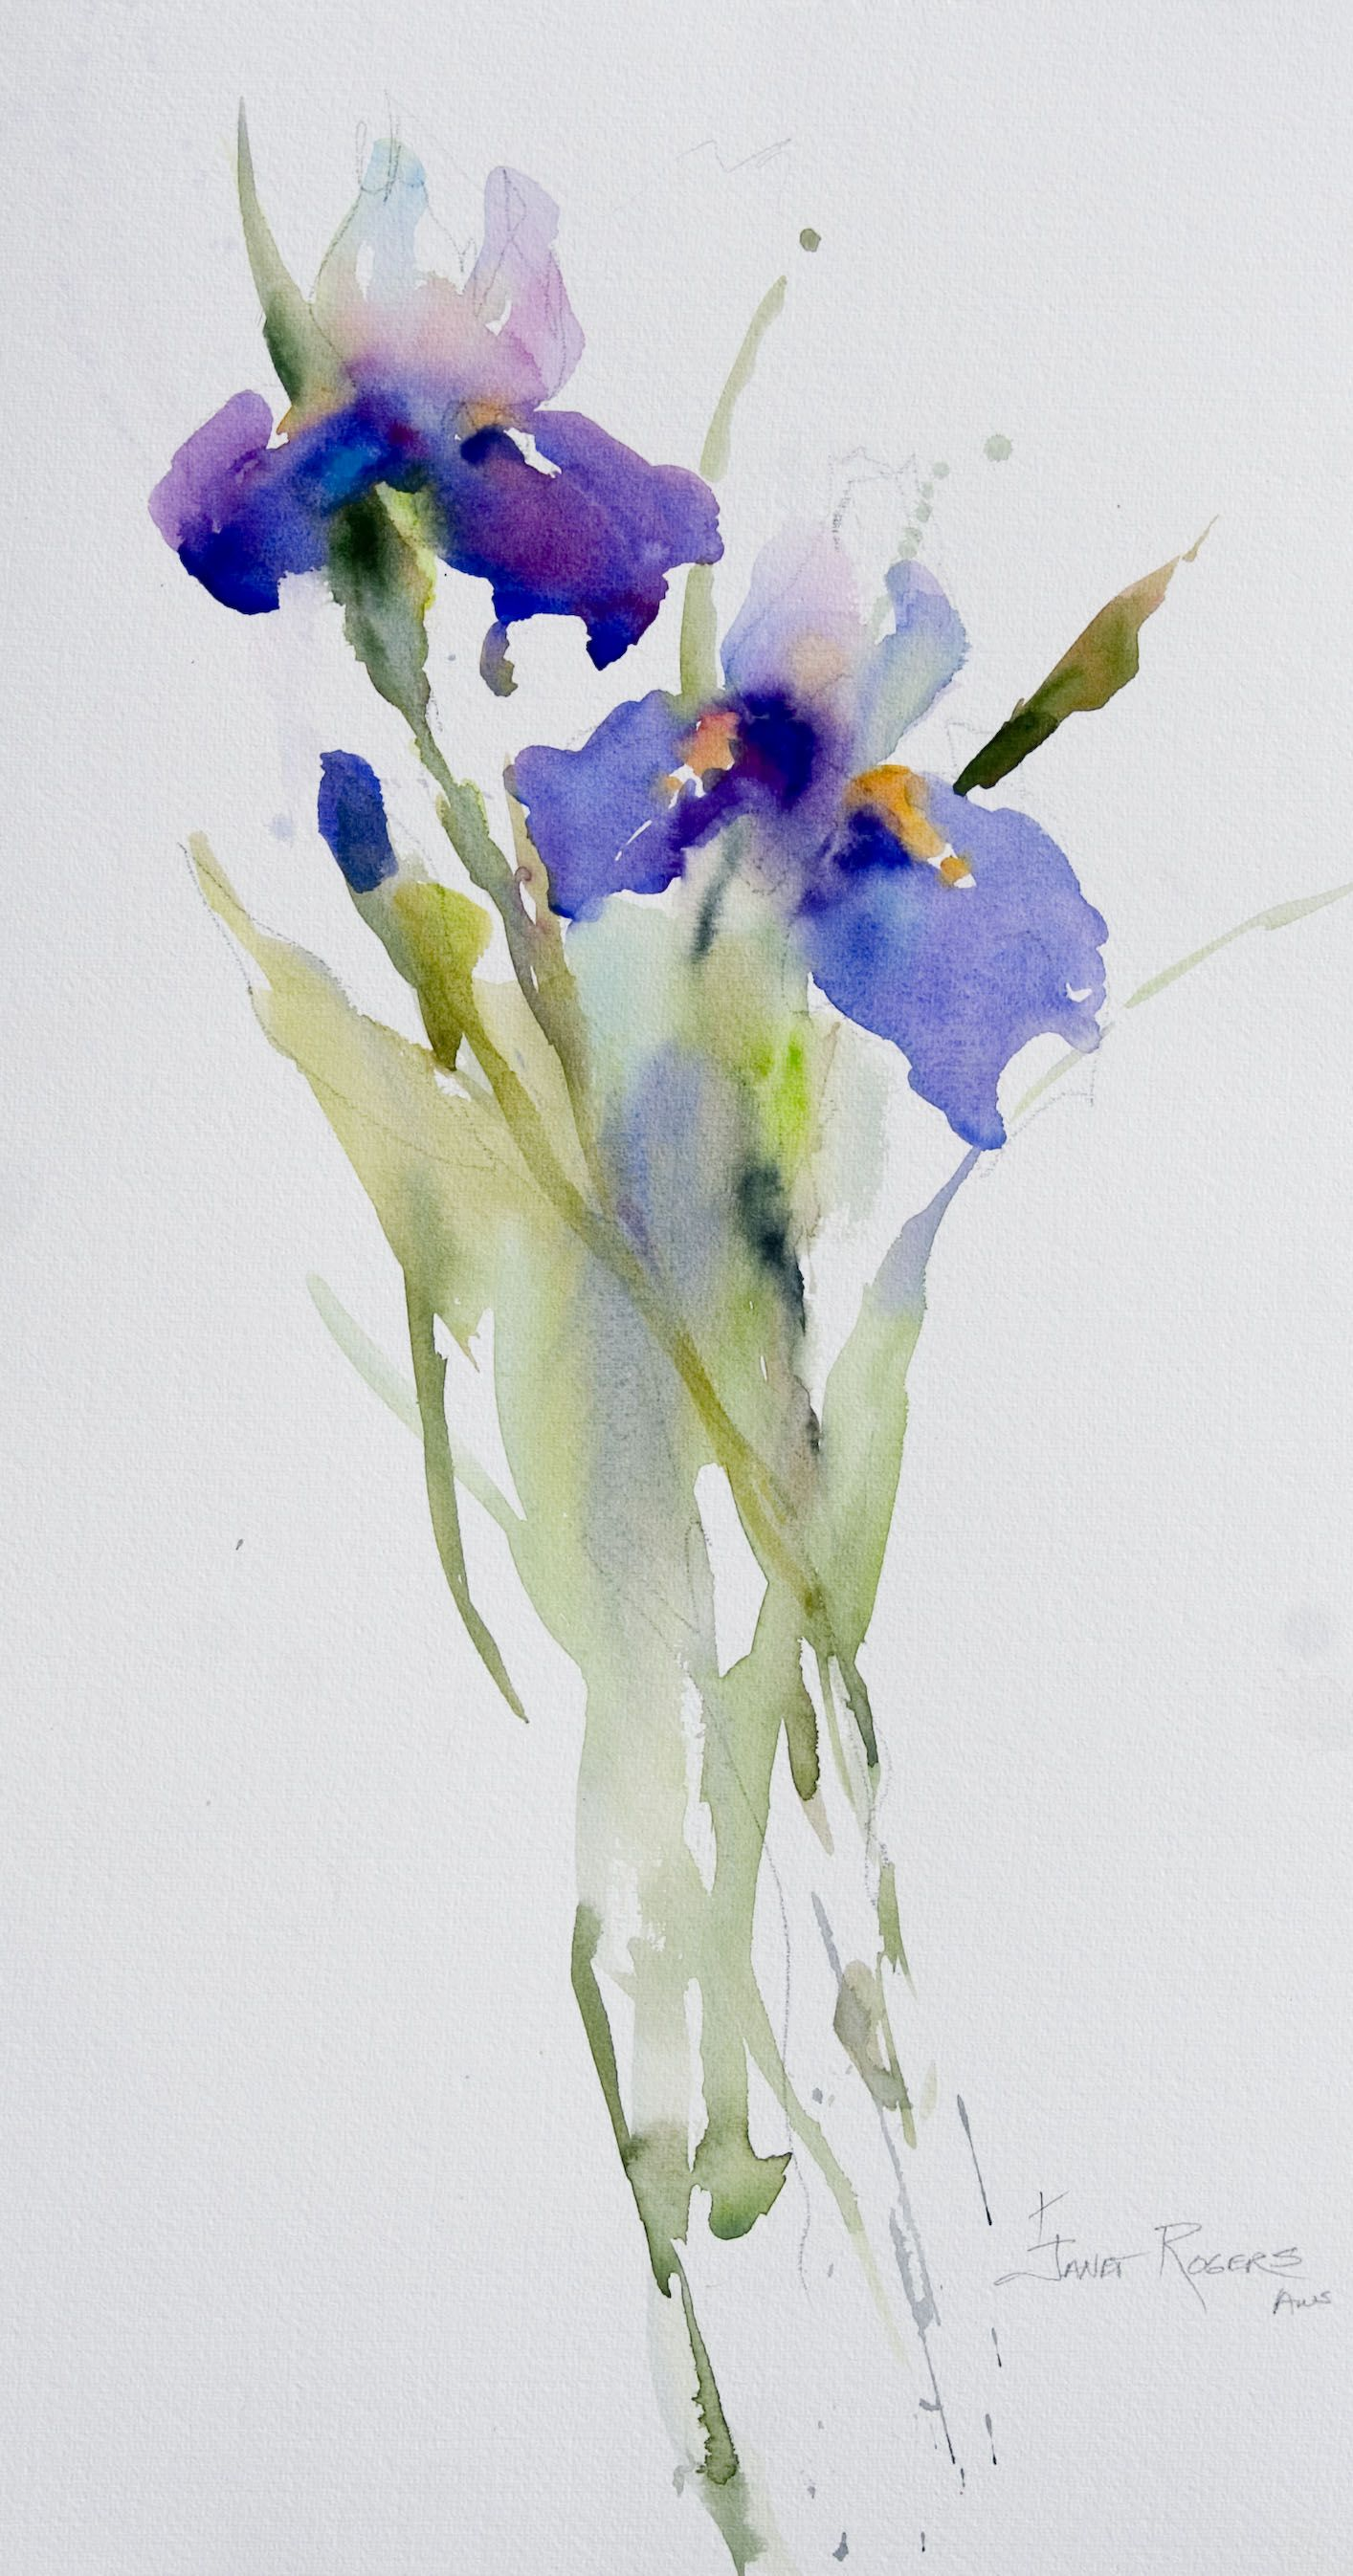 Janet rogers irises watercolor pinterest watercolor painting janet rogers irises izmirmasajfo